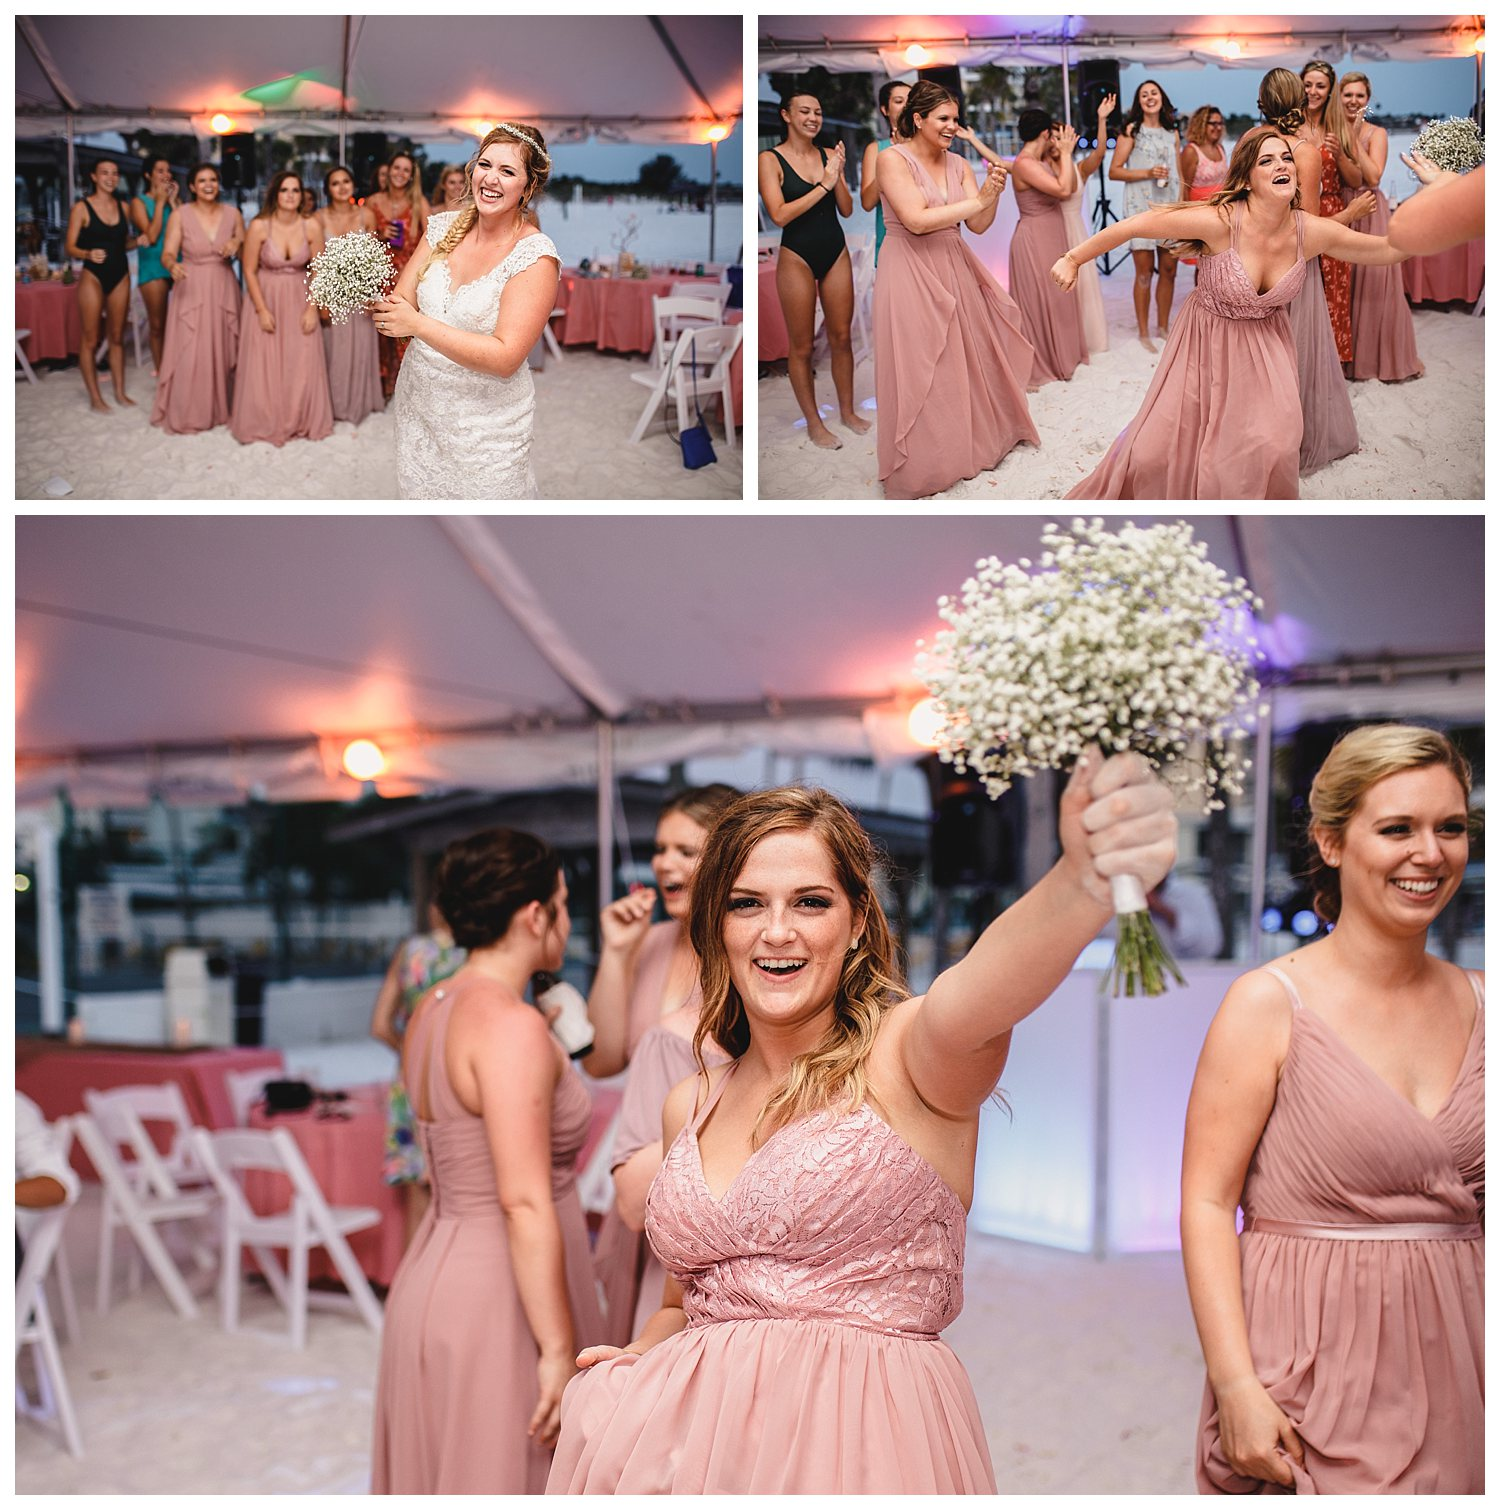 Kelsey_Diane_Photography_Destination_Wedding_Sarasota_Florida_Beach_Wedding_Alex_Austin_0684.jpg